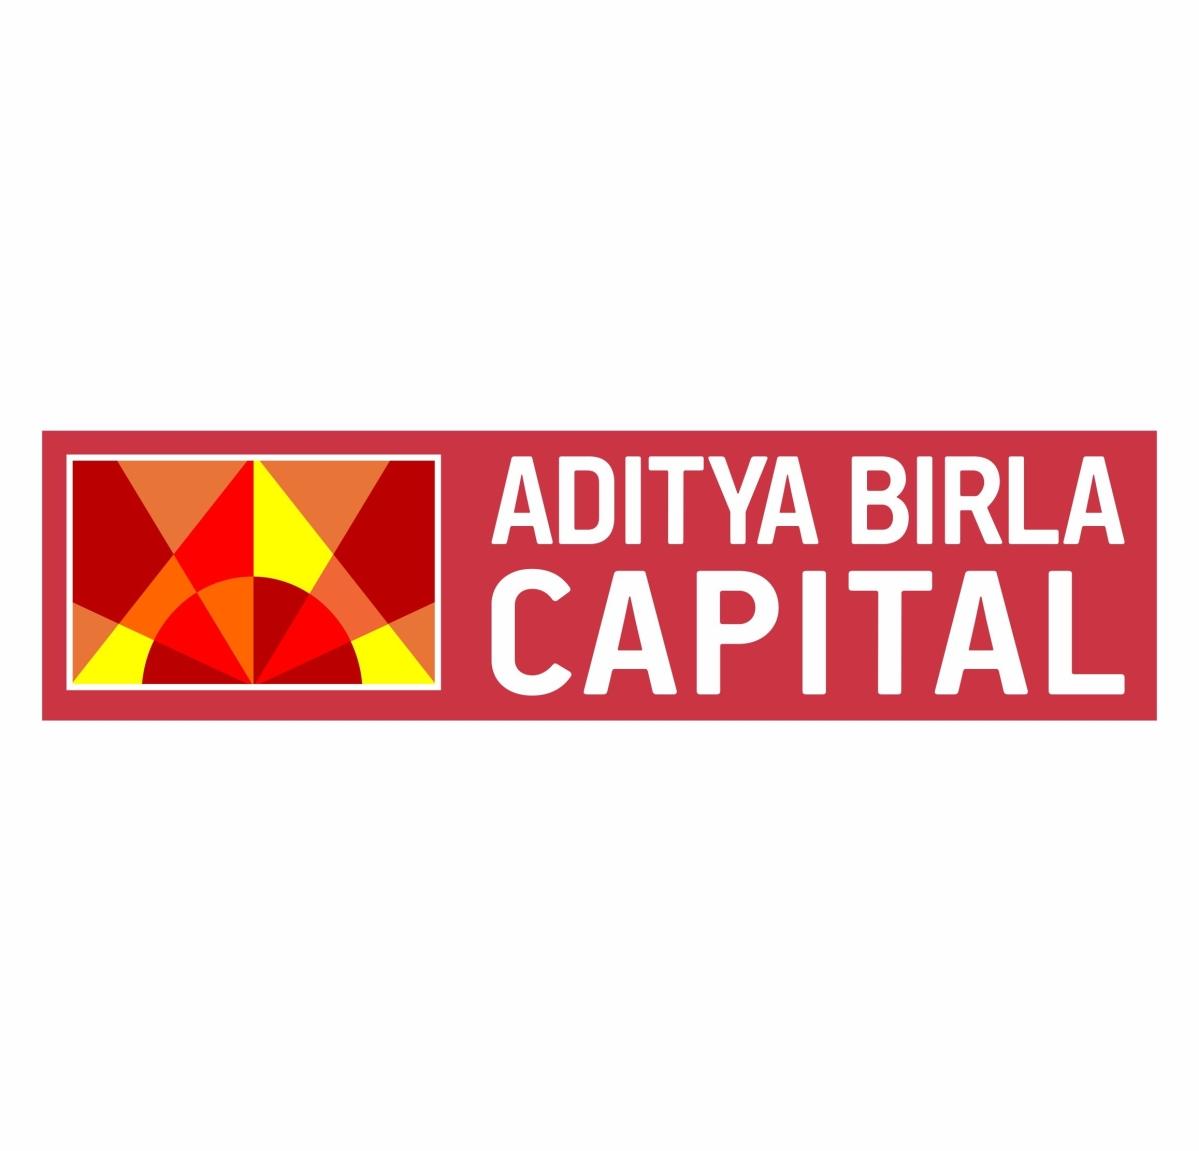 Results: Aditya Birla Capital posts Rs 375 crore net profit in Q4